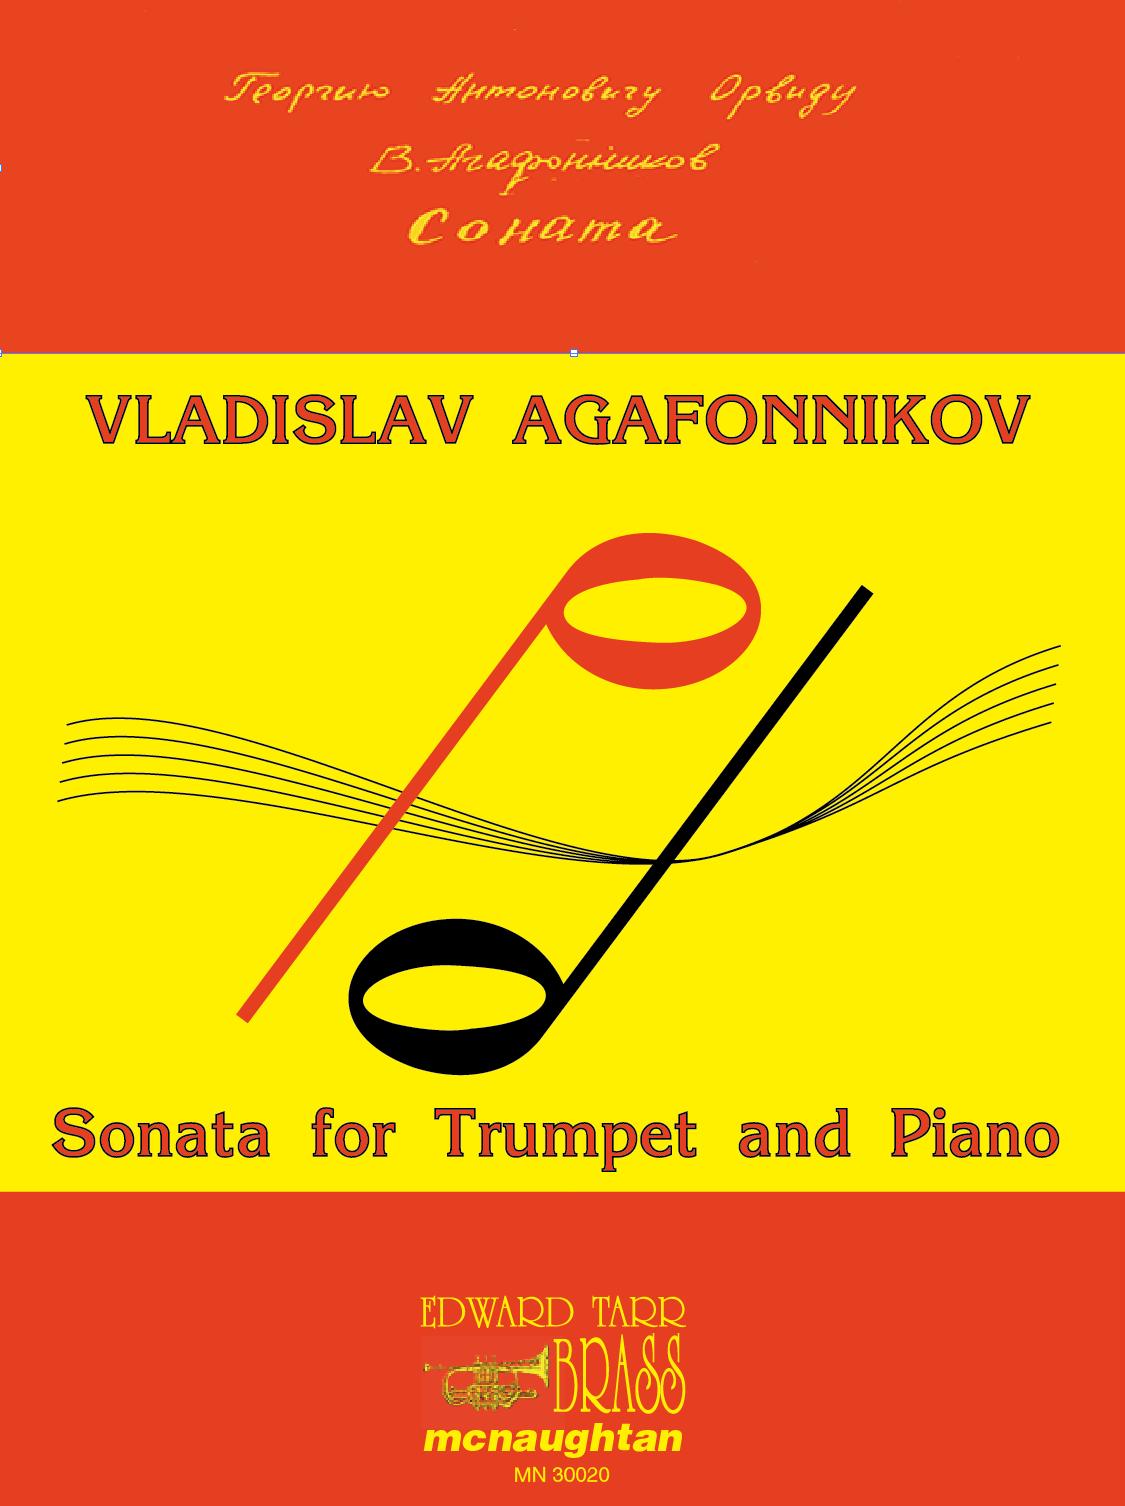 AGAFONNIKOV Sonata